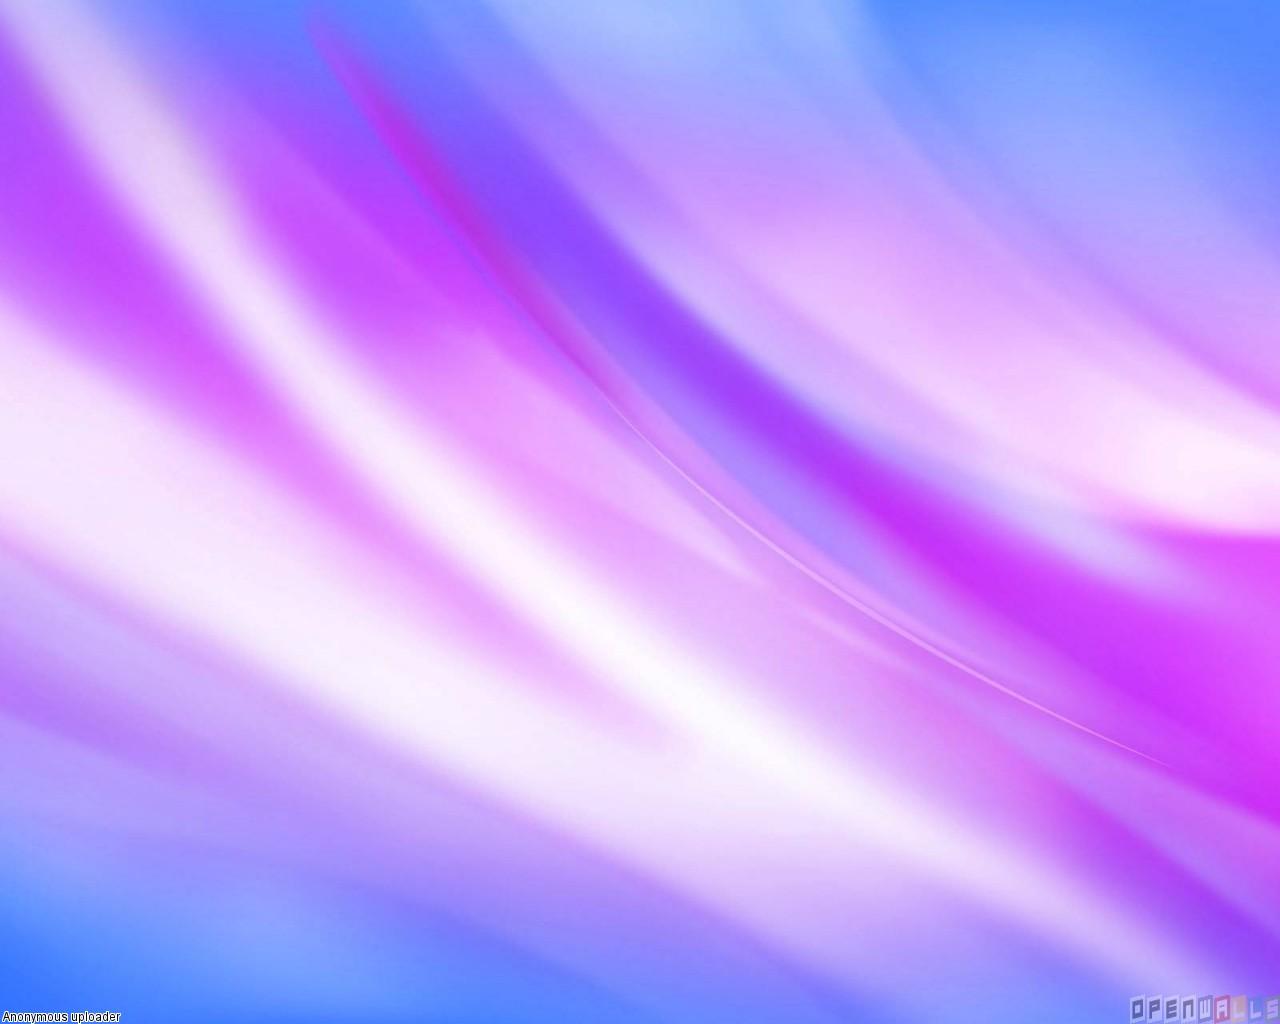 Purple and blue wallpaper 346   Open Walls 1280x1024